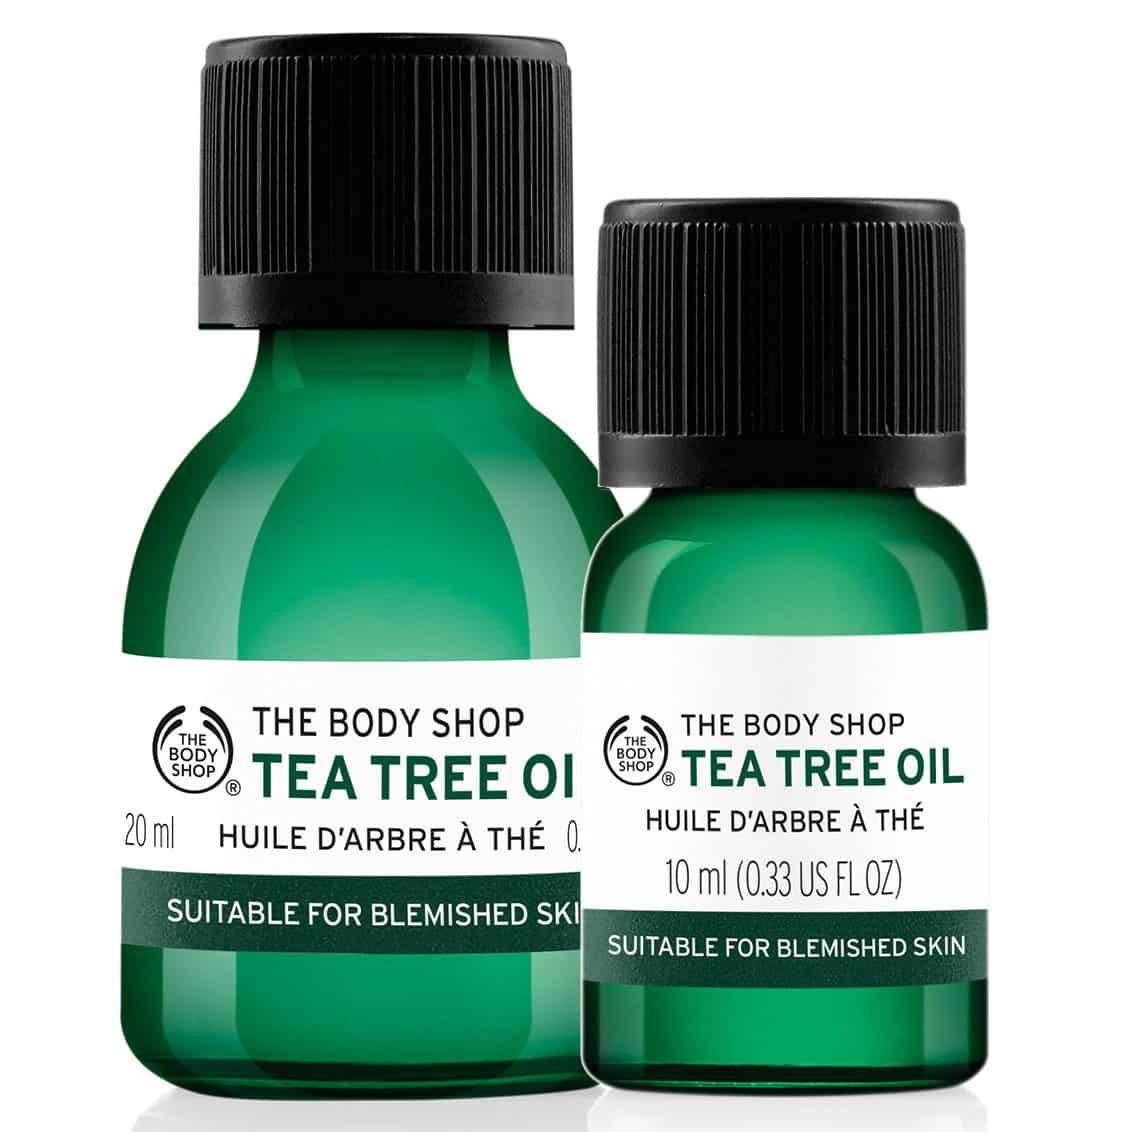 Tea Tree Oil. 10ml £8 / 20ml £11. The Body Shop.